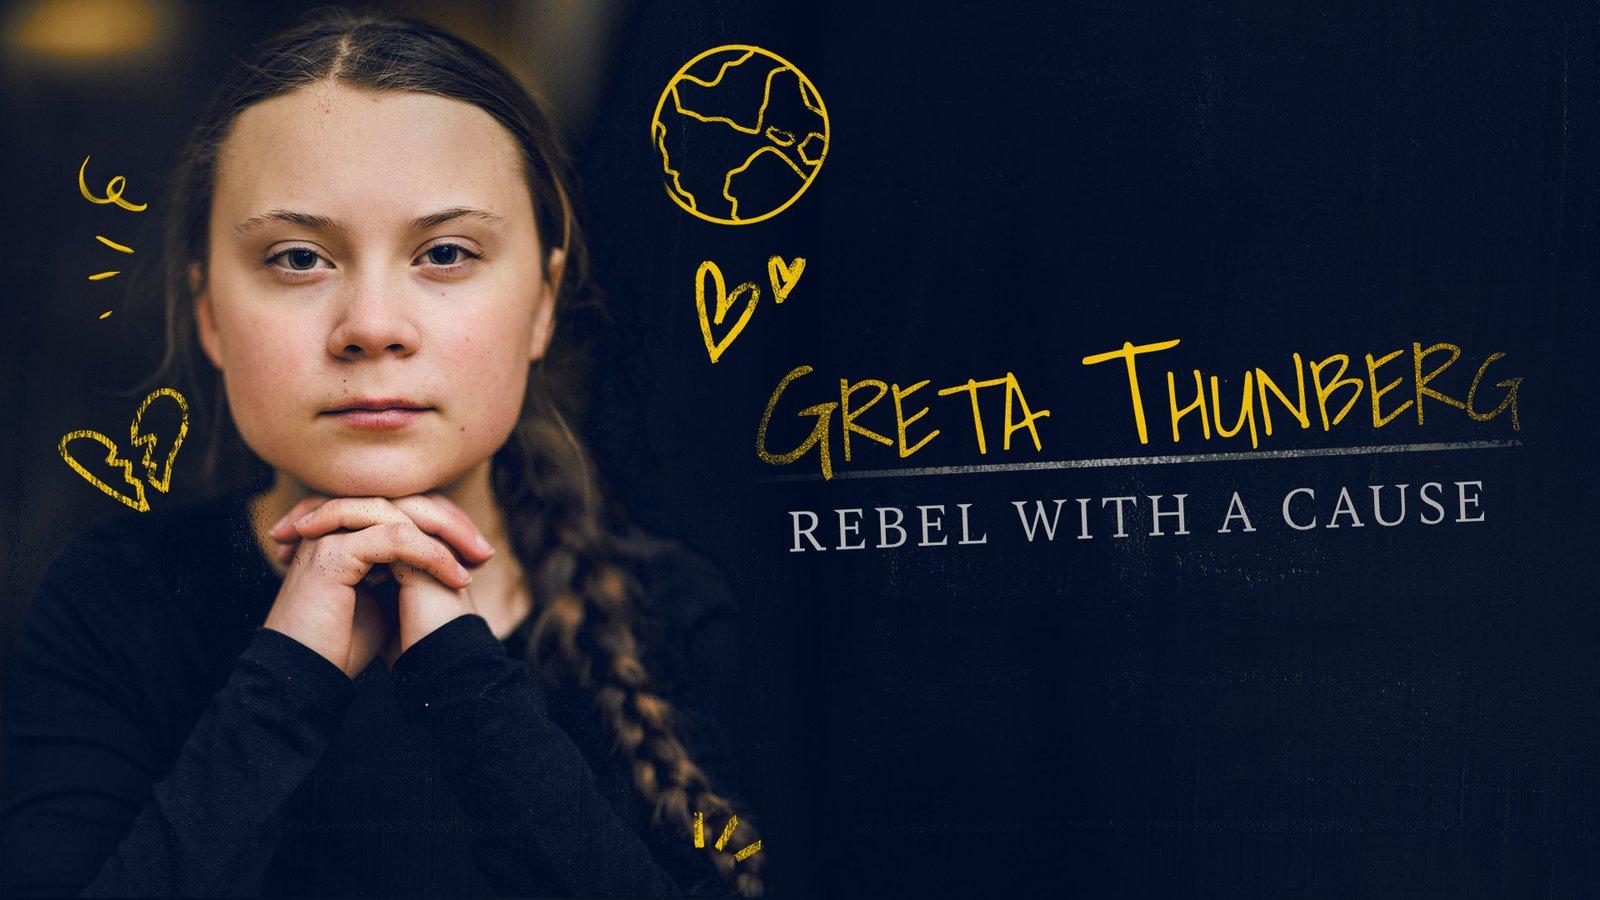 Greta Thunberg: Rebel with a Cause